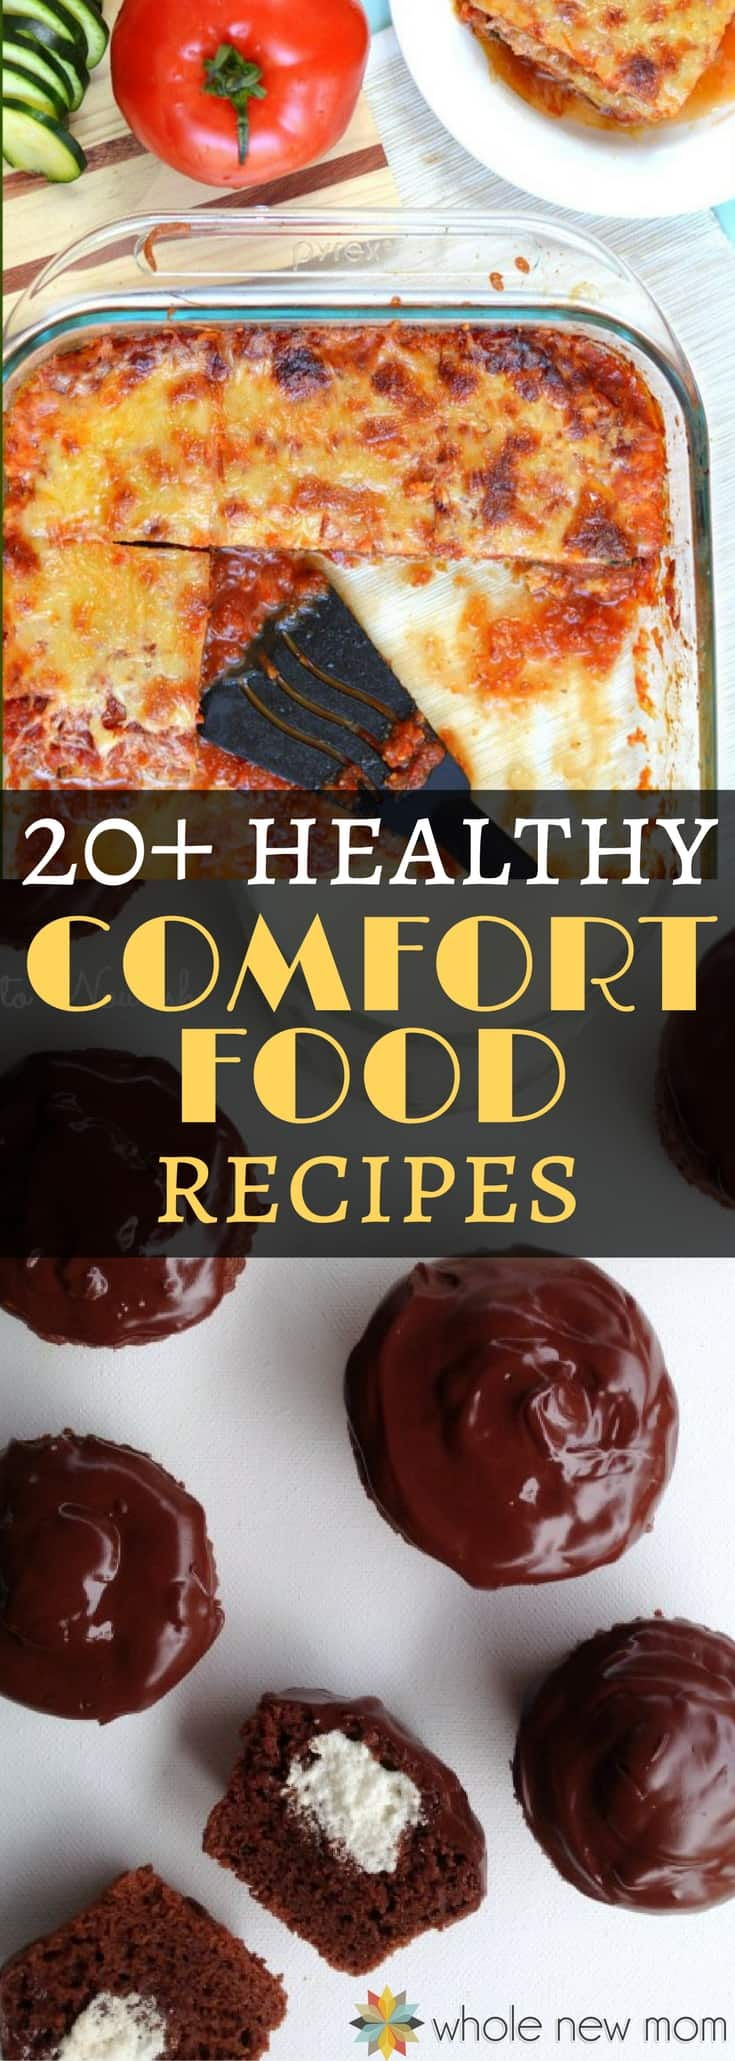 Healthy Comfort Food Recipes - gluten-free